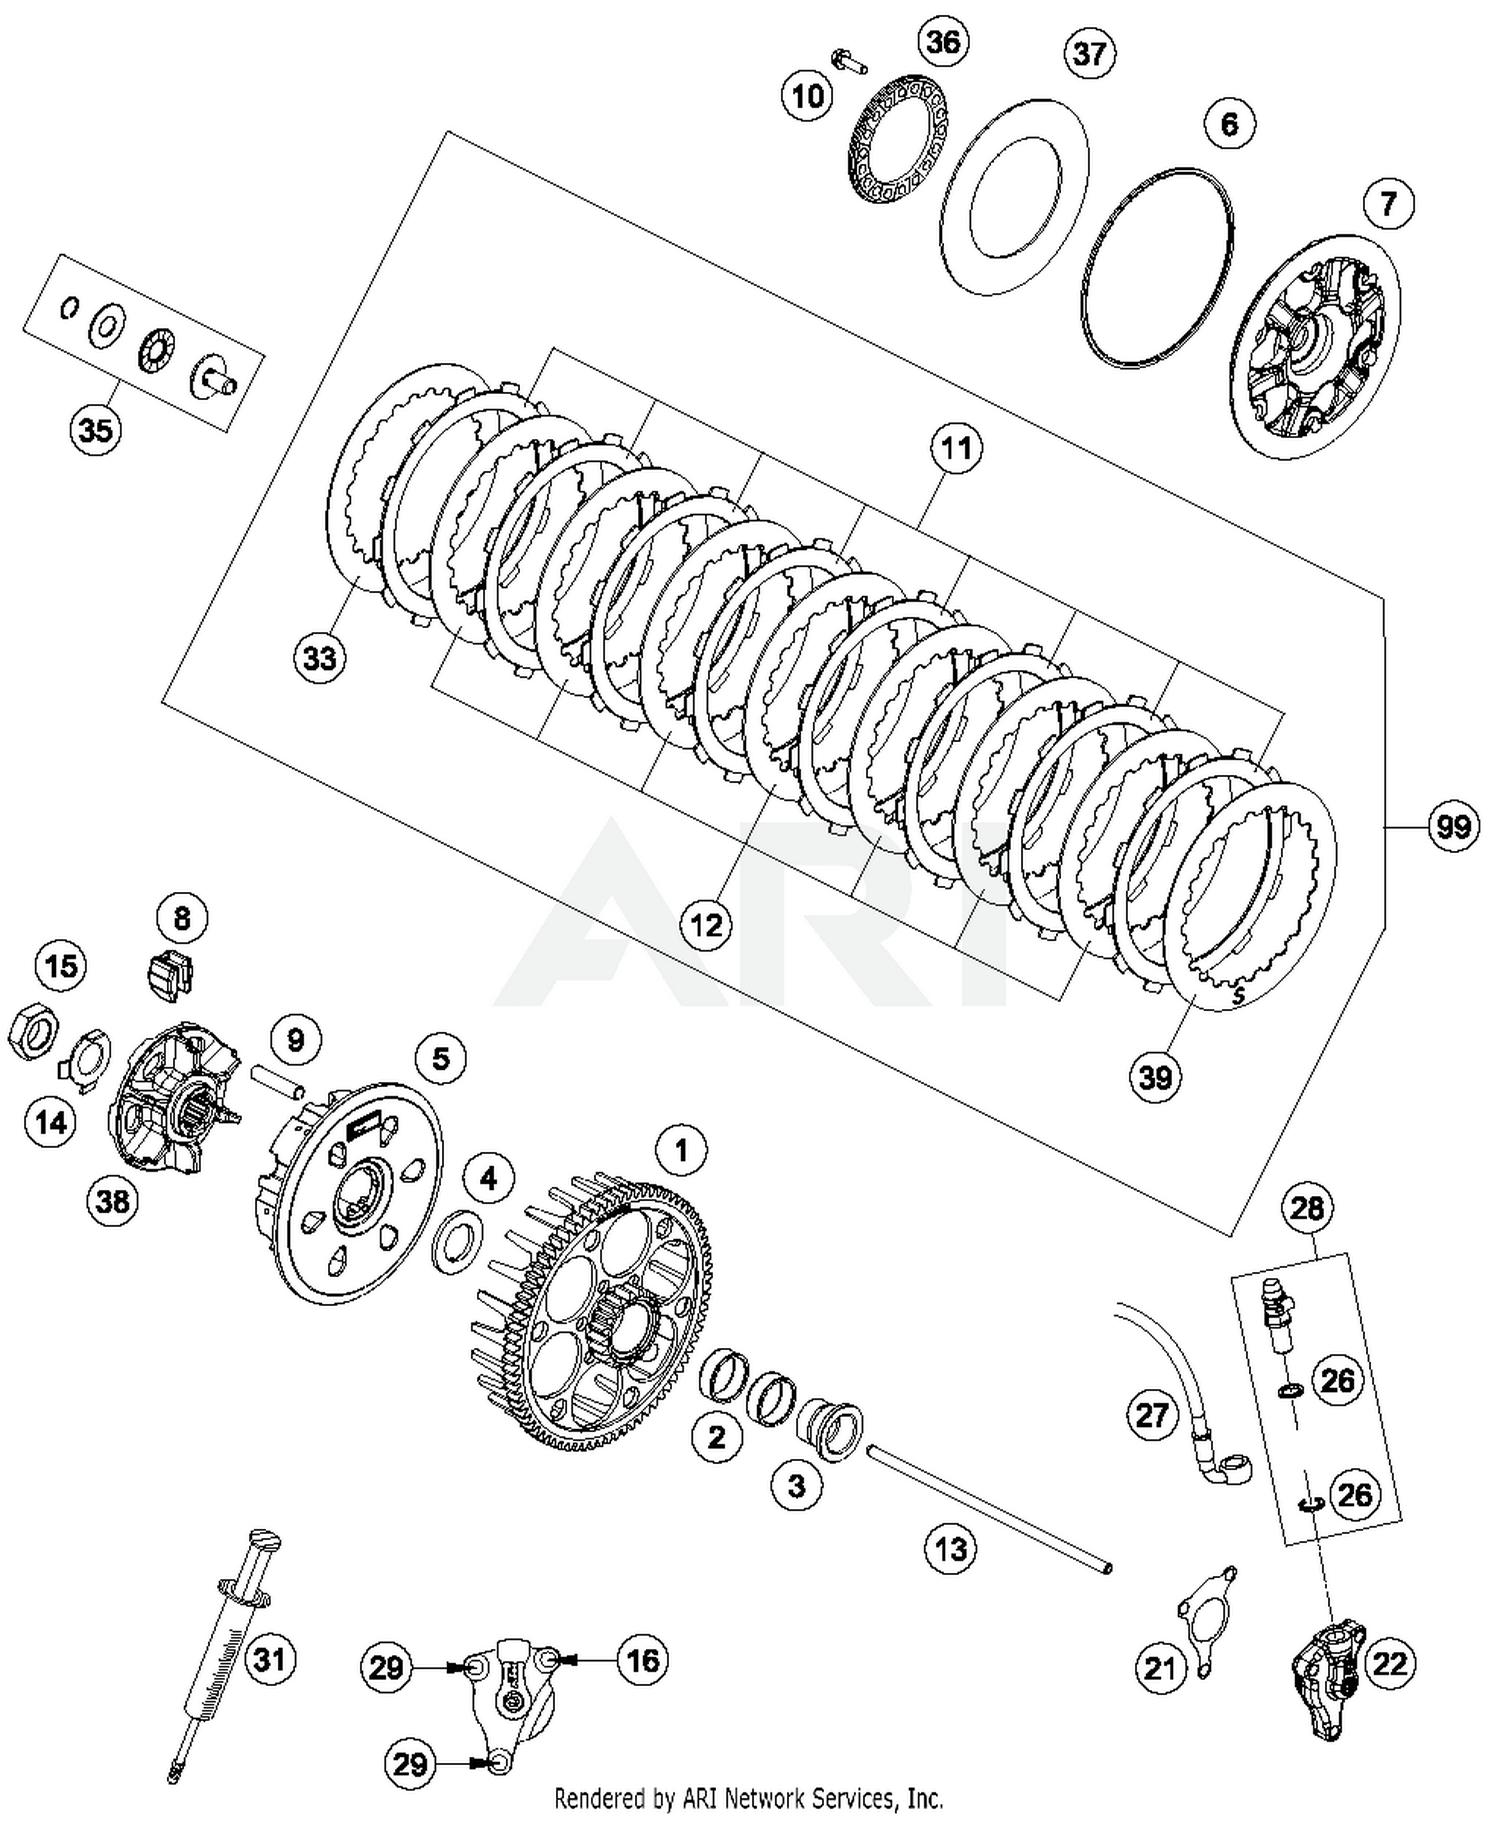 2017 husqvarna fe 501 clutch parts best oem clutch parts diagram rh bikebandit com Husaberg Fe 501 husqvarna fe 501 wiring diagram